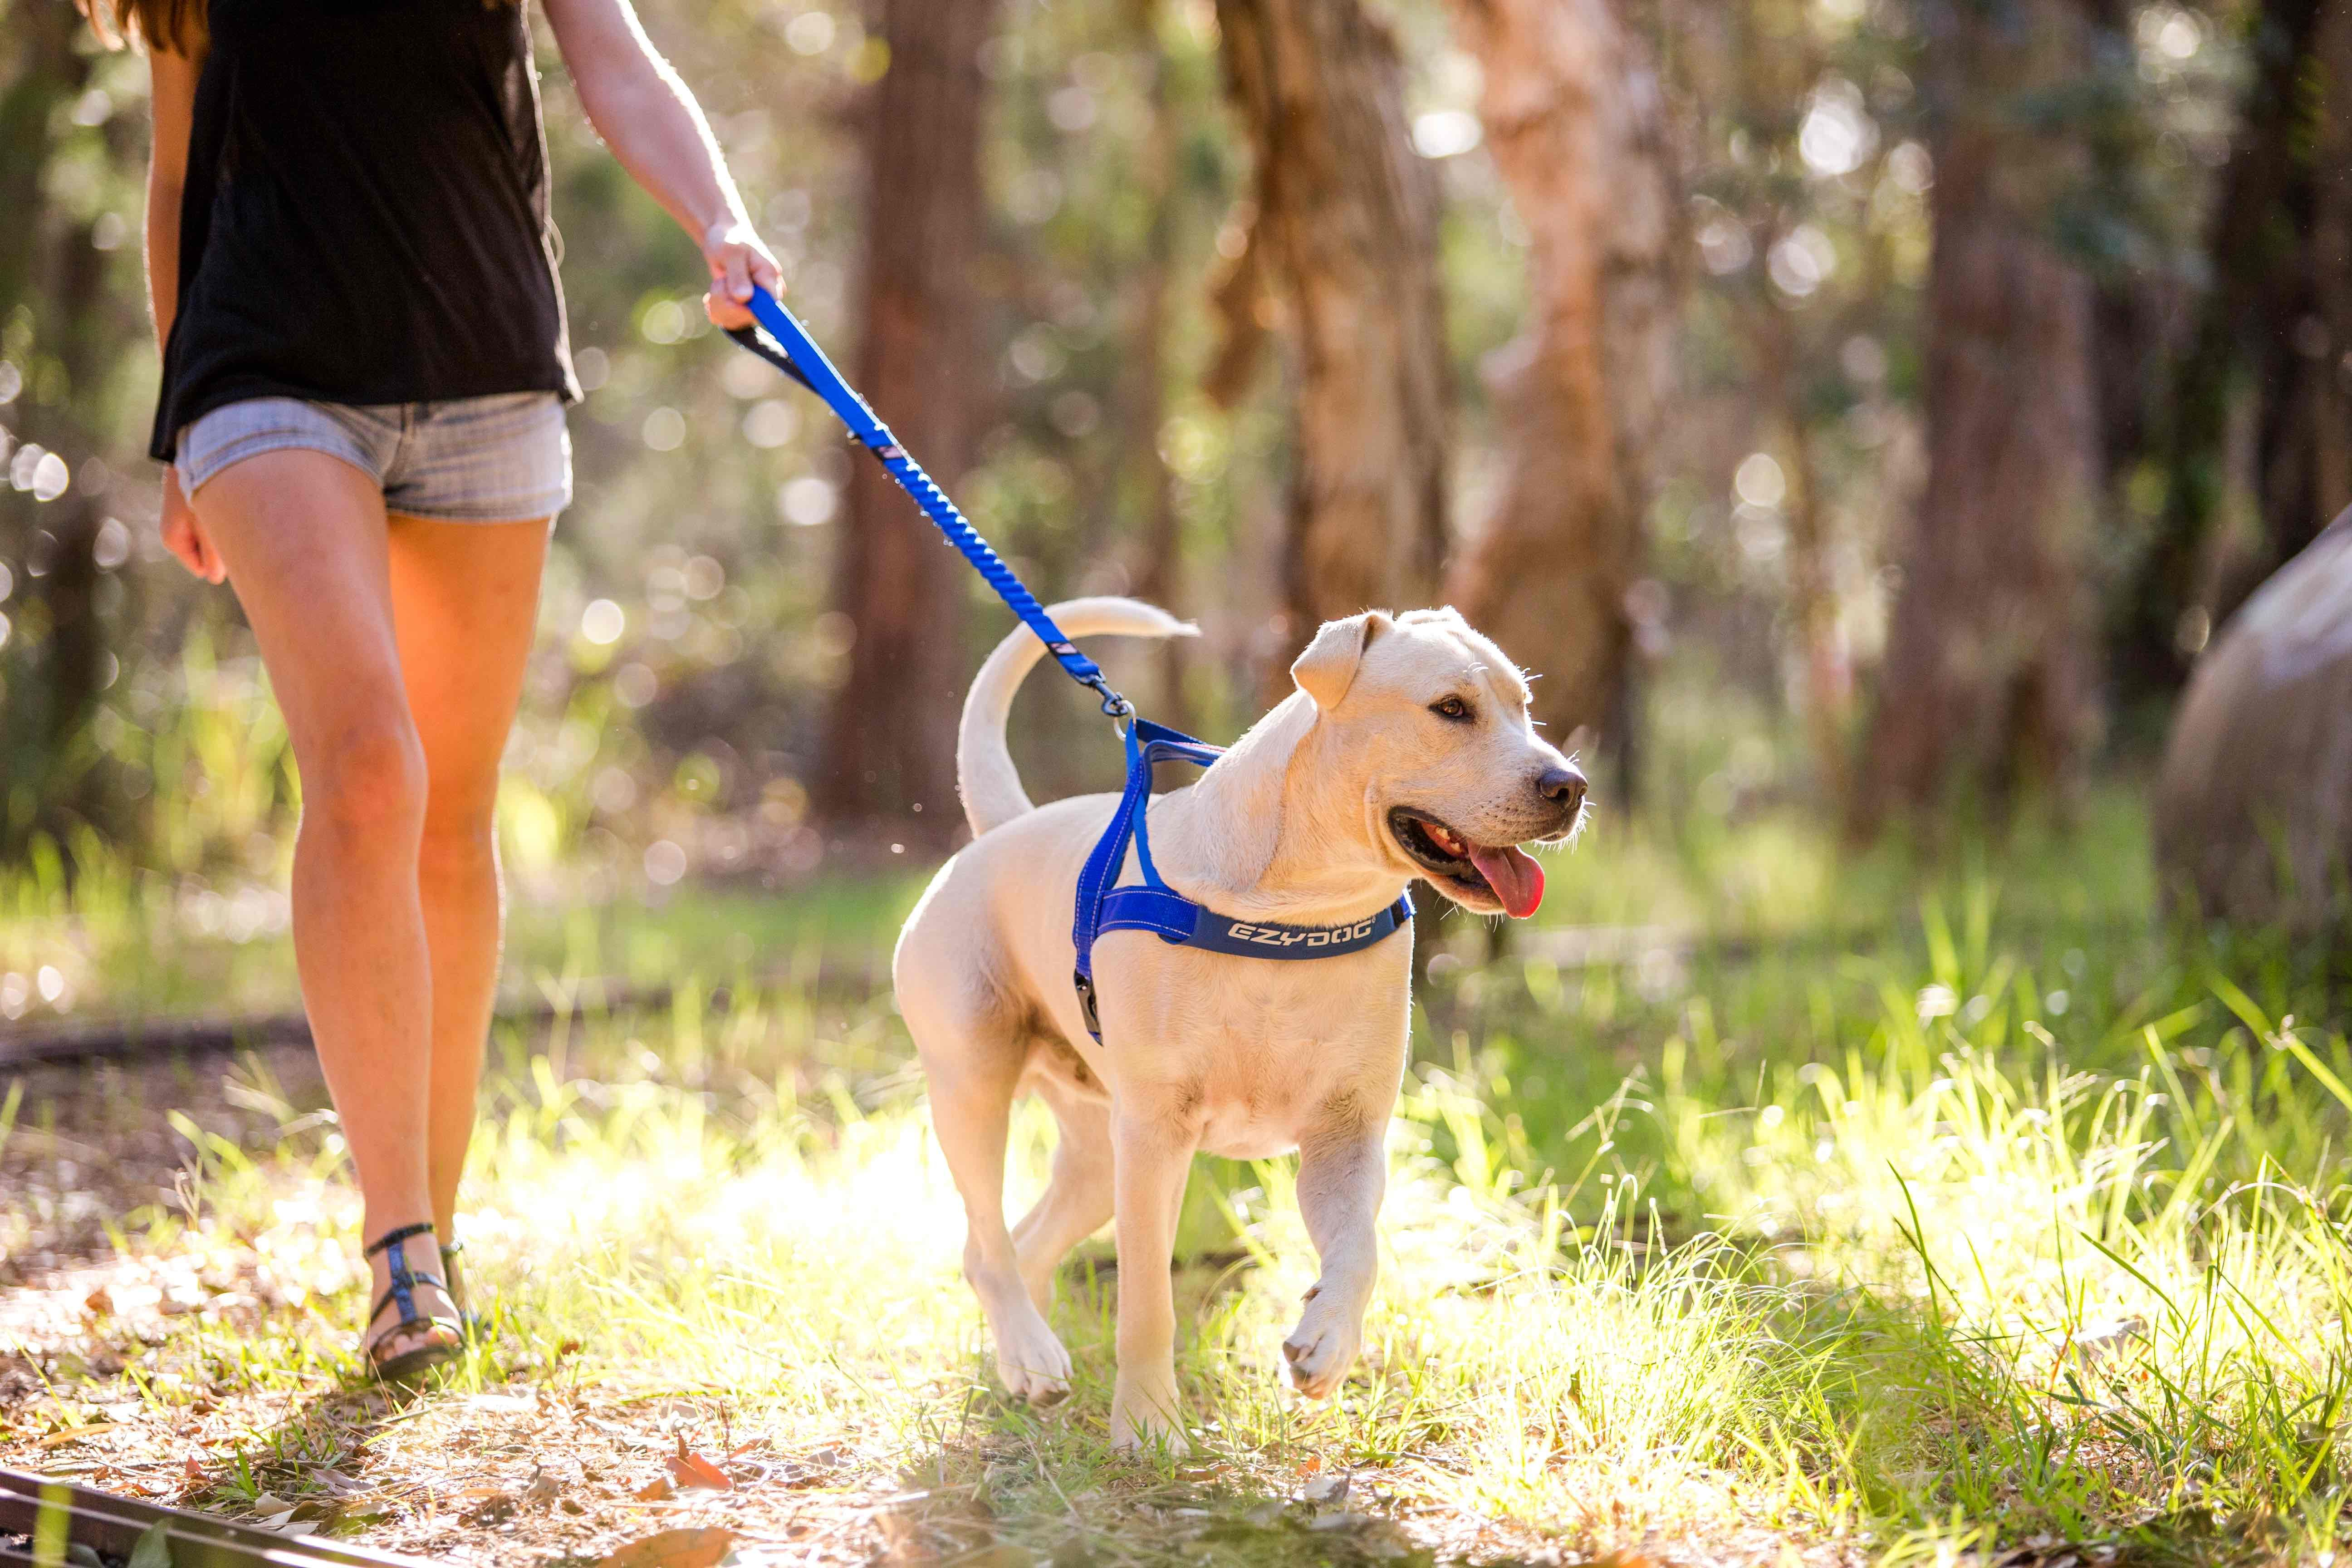 Ezydog Zero Shock Leash With Quick Fit Harness Dog Leash Dog